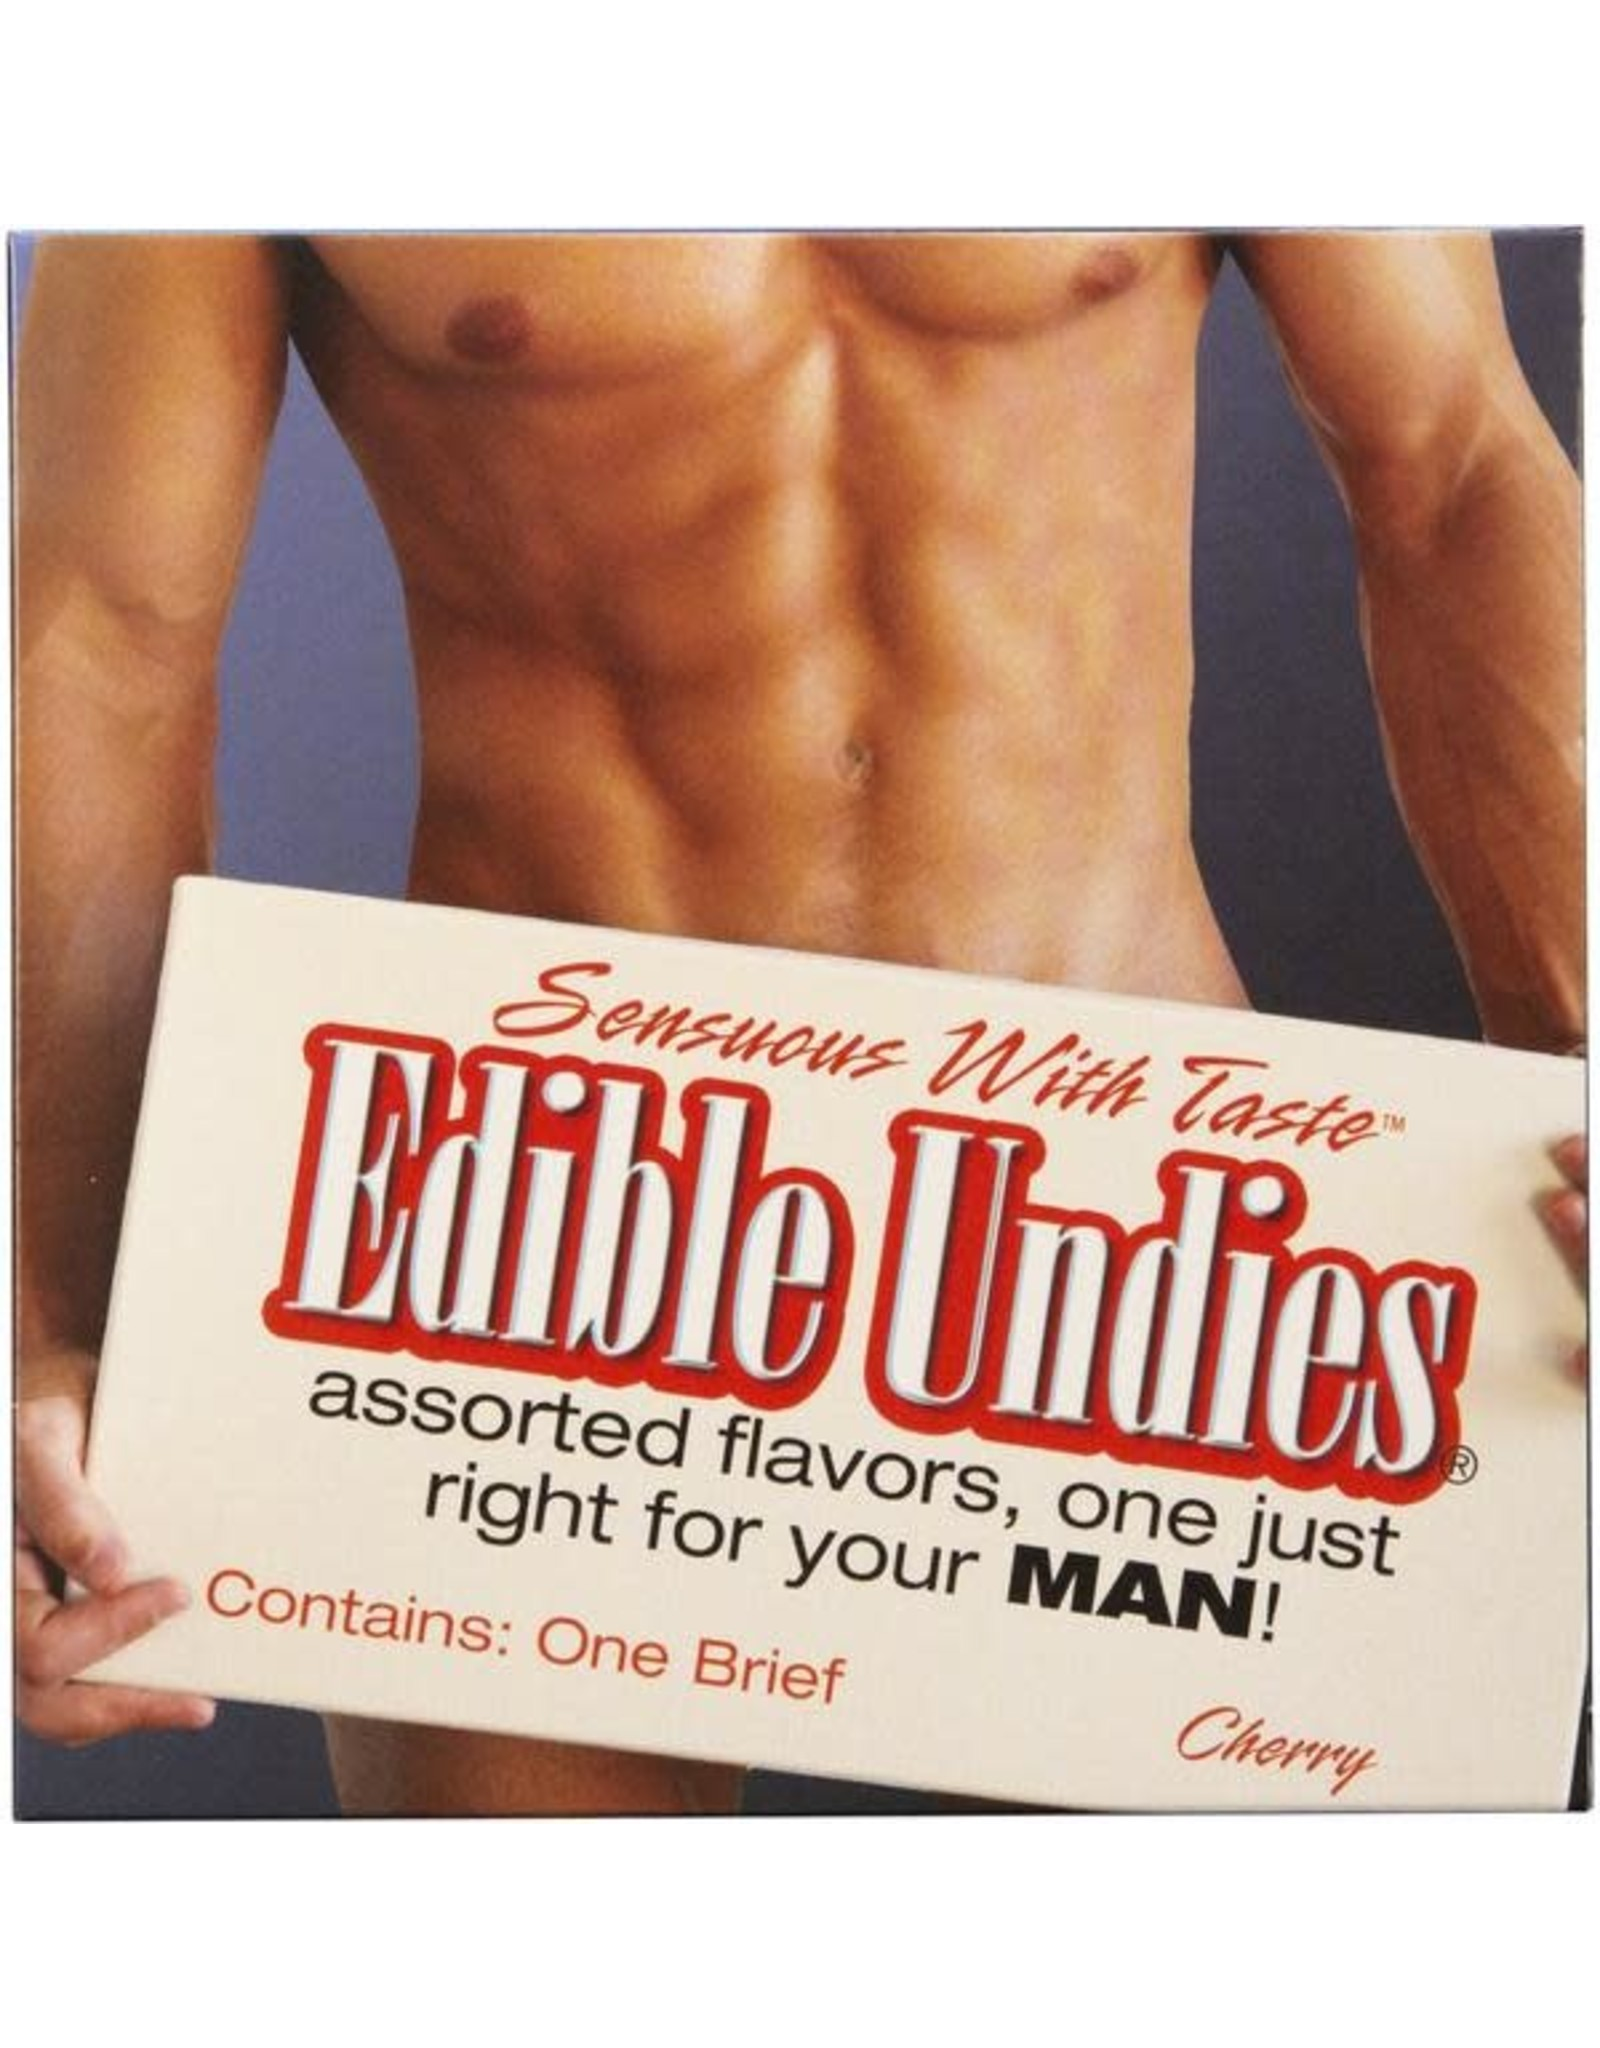 EDIBLE UNDIES FOR MEN - CHERRY